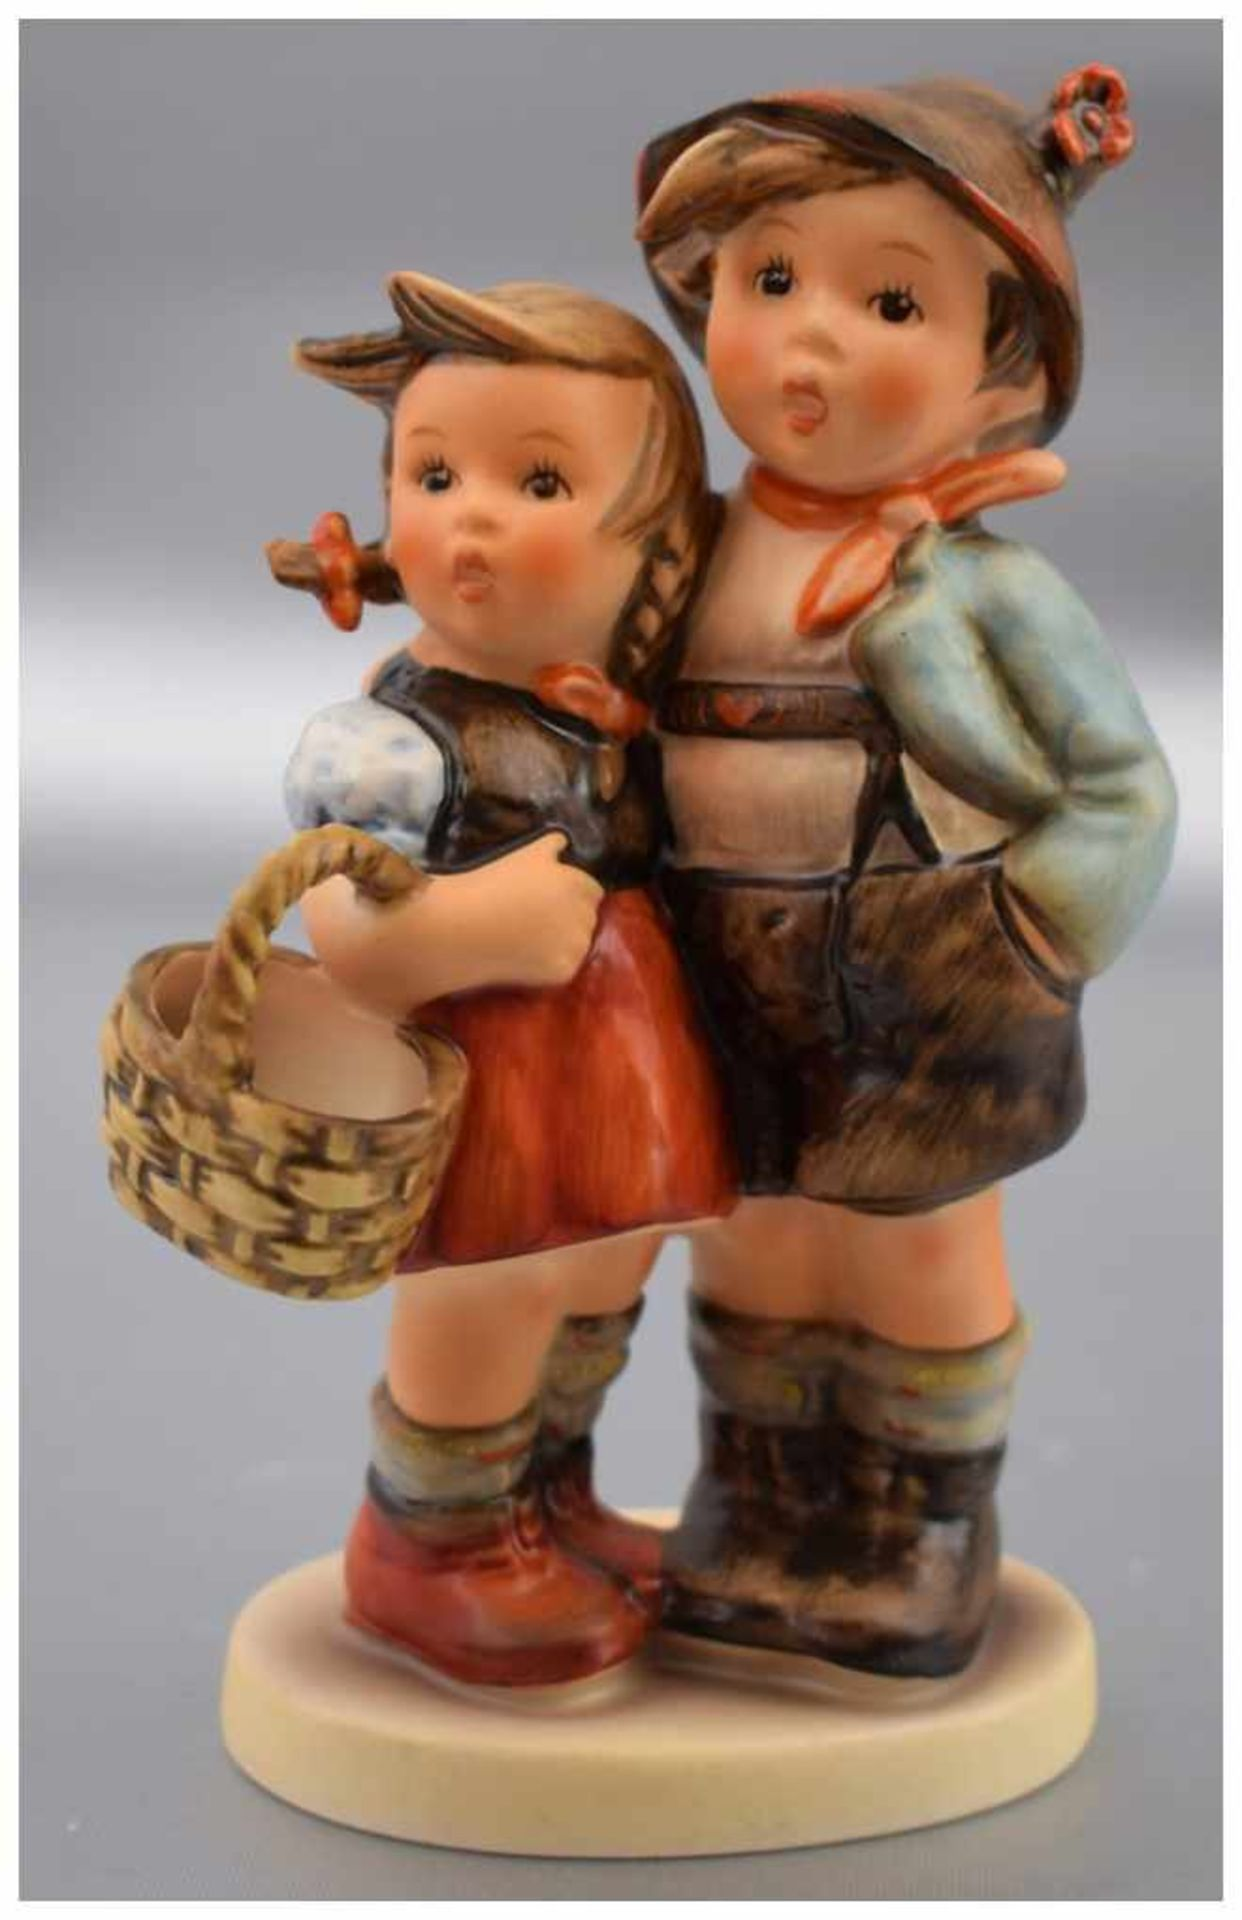 Los 20 - Geschwisterpaar auf ovalem Sockel stehend, bunt bemalt, im Sockel sign. M.J. Hummel, H 14 cm, FM